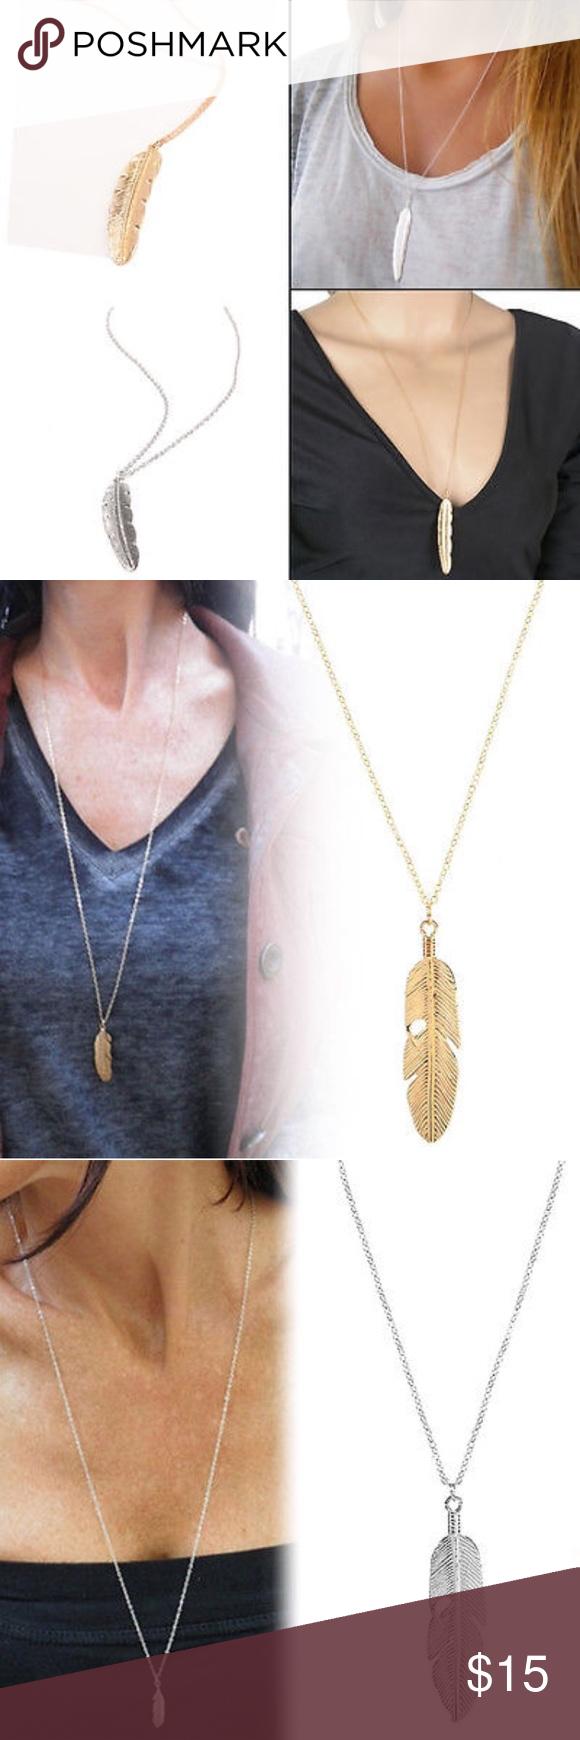 Coming Soon!  Long Leaf Pendant Necklace Material: Alloy Feather length: 6cm, width :1.5cm Chain length: 60cm+7cm True Gem Boutique Jewelry Necklaces